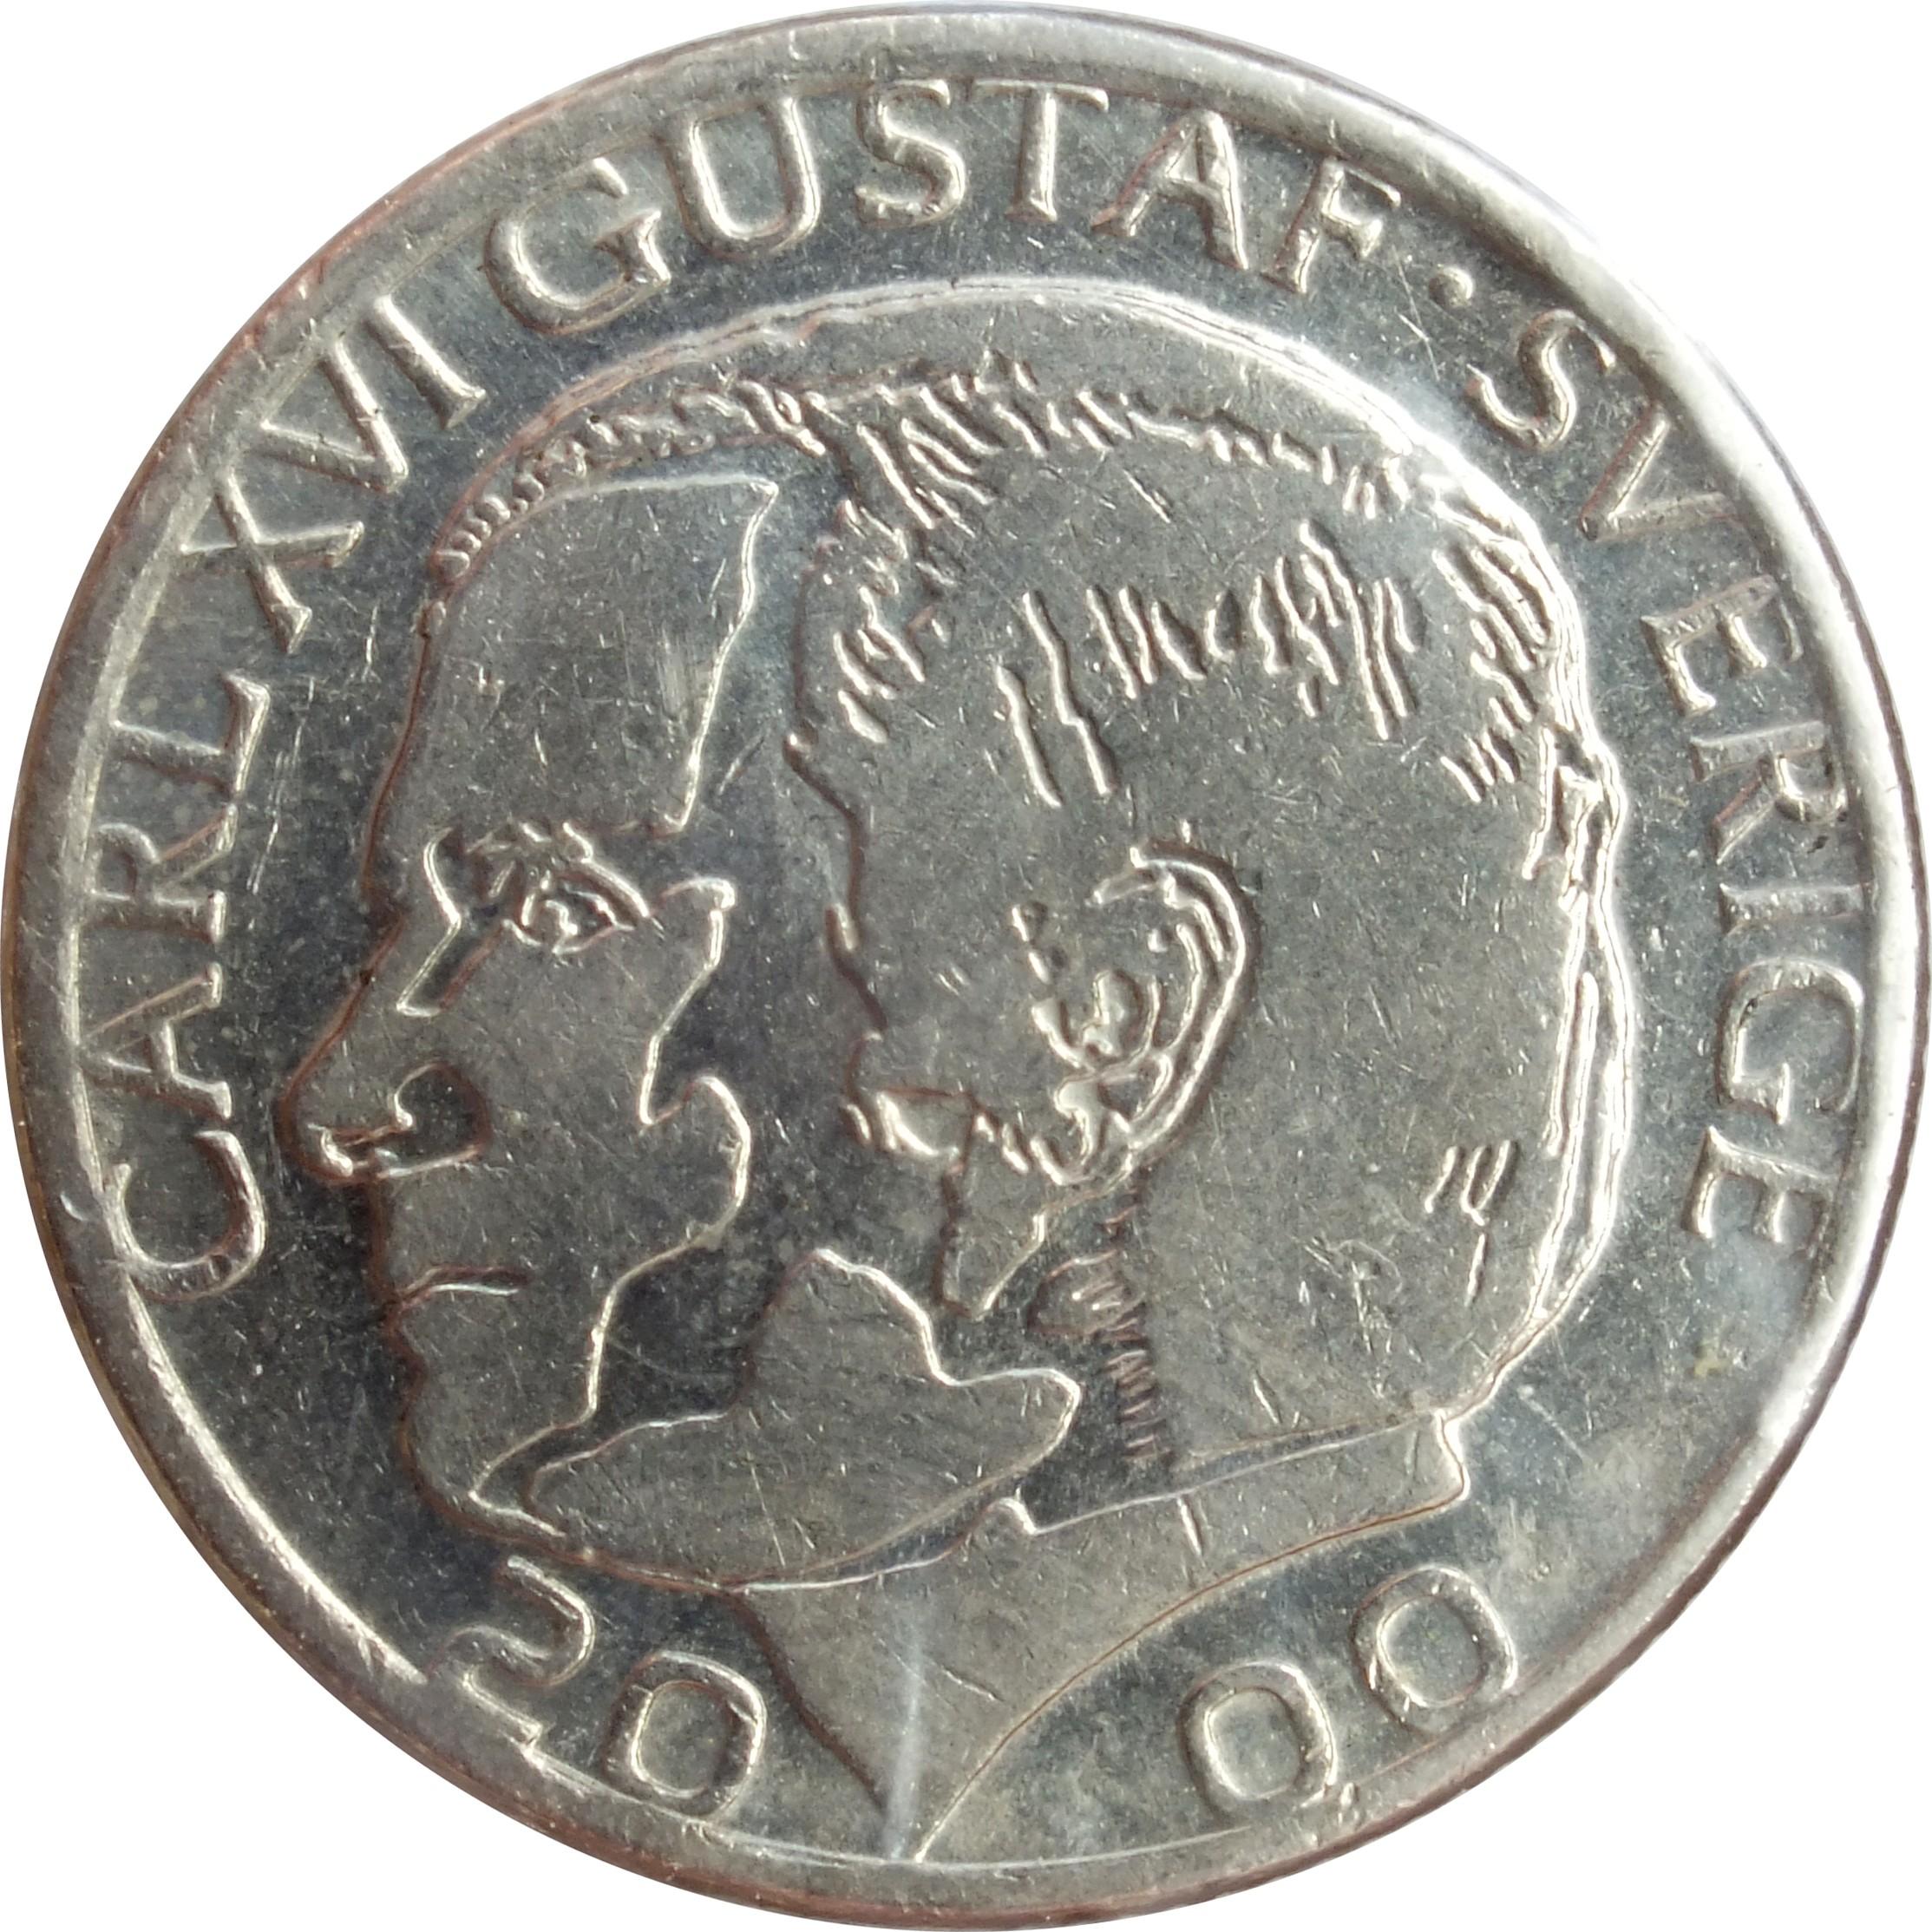 1 Krona - Carl XVI Gustaf (1982-2000) Sweden KM# 852a ...